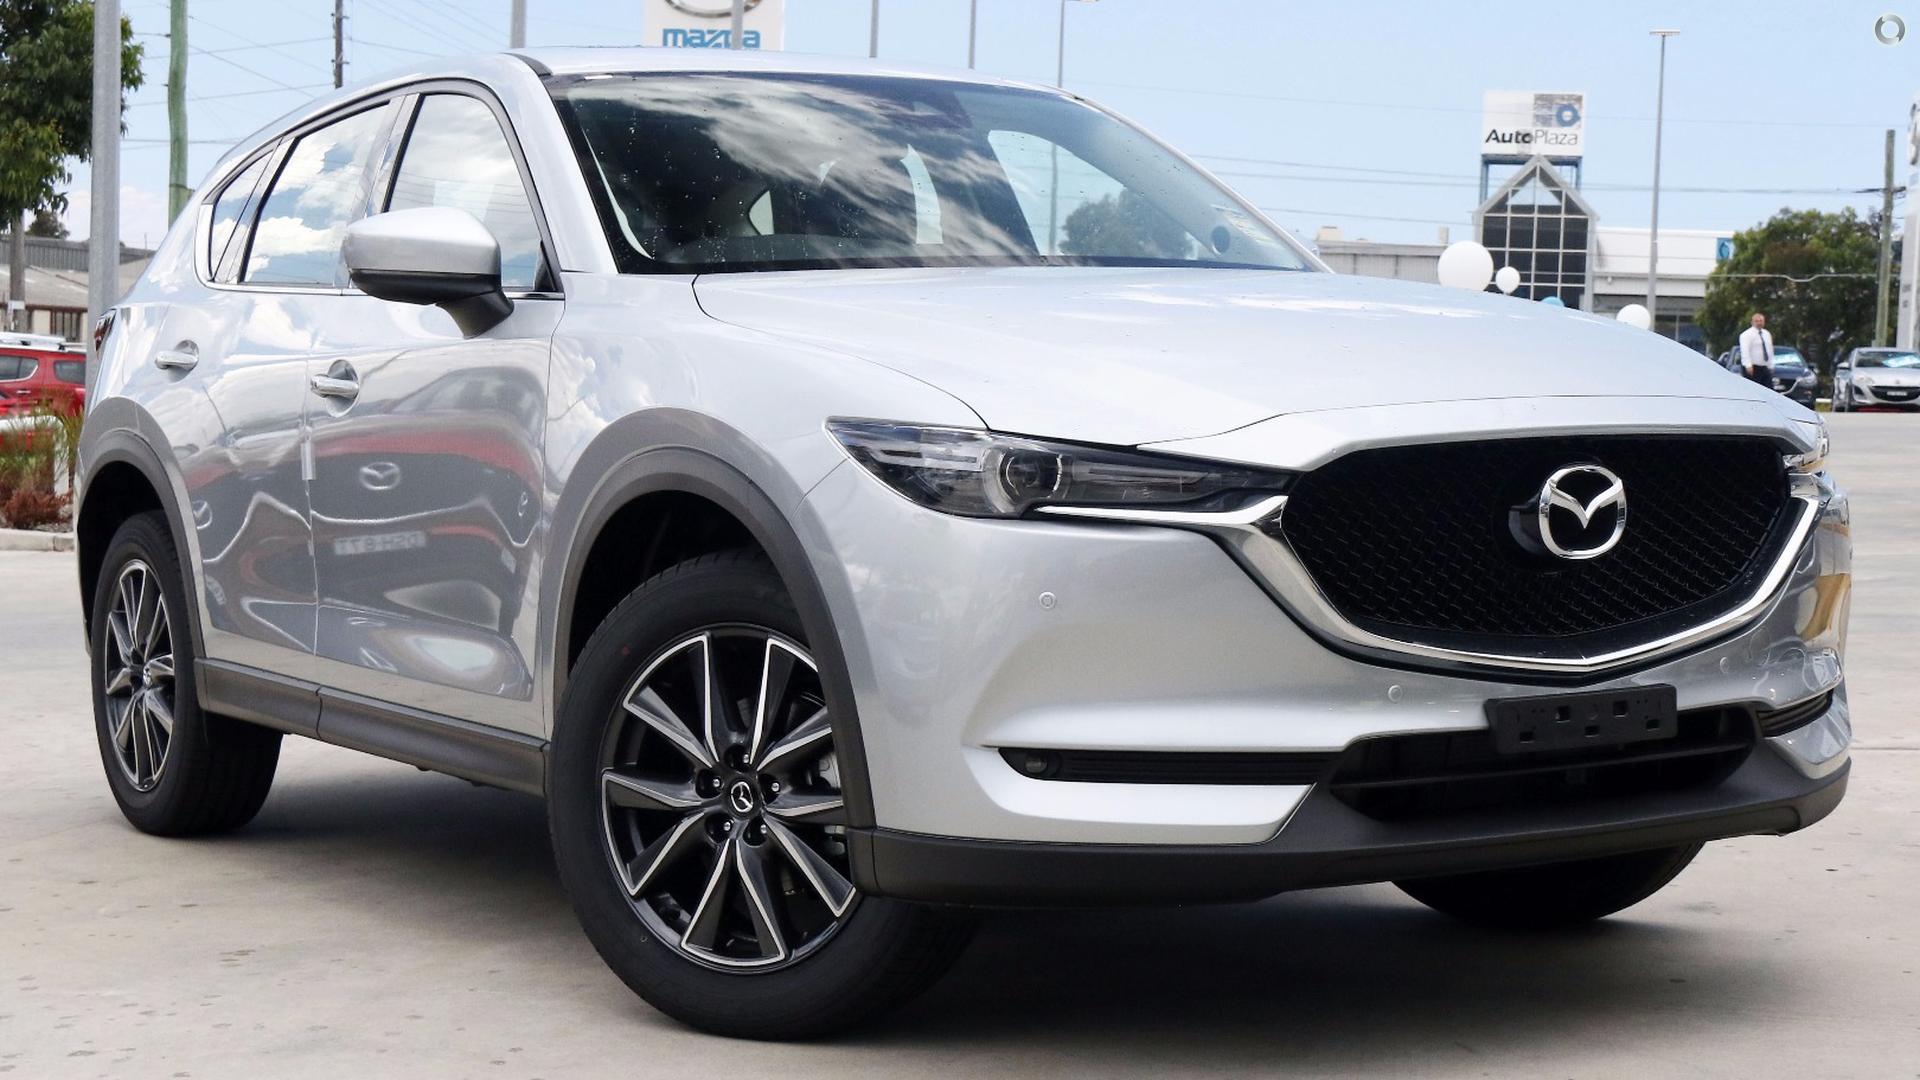 2018 Mazda Cx-5 KF Series